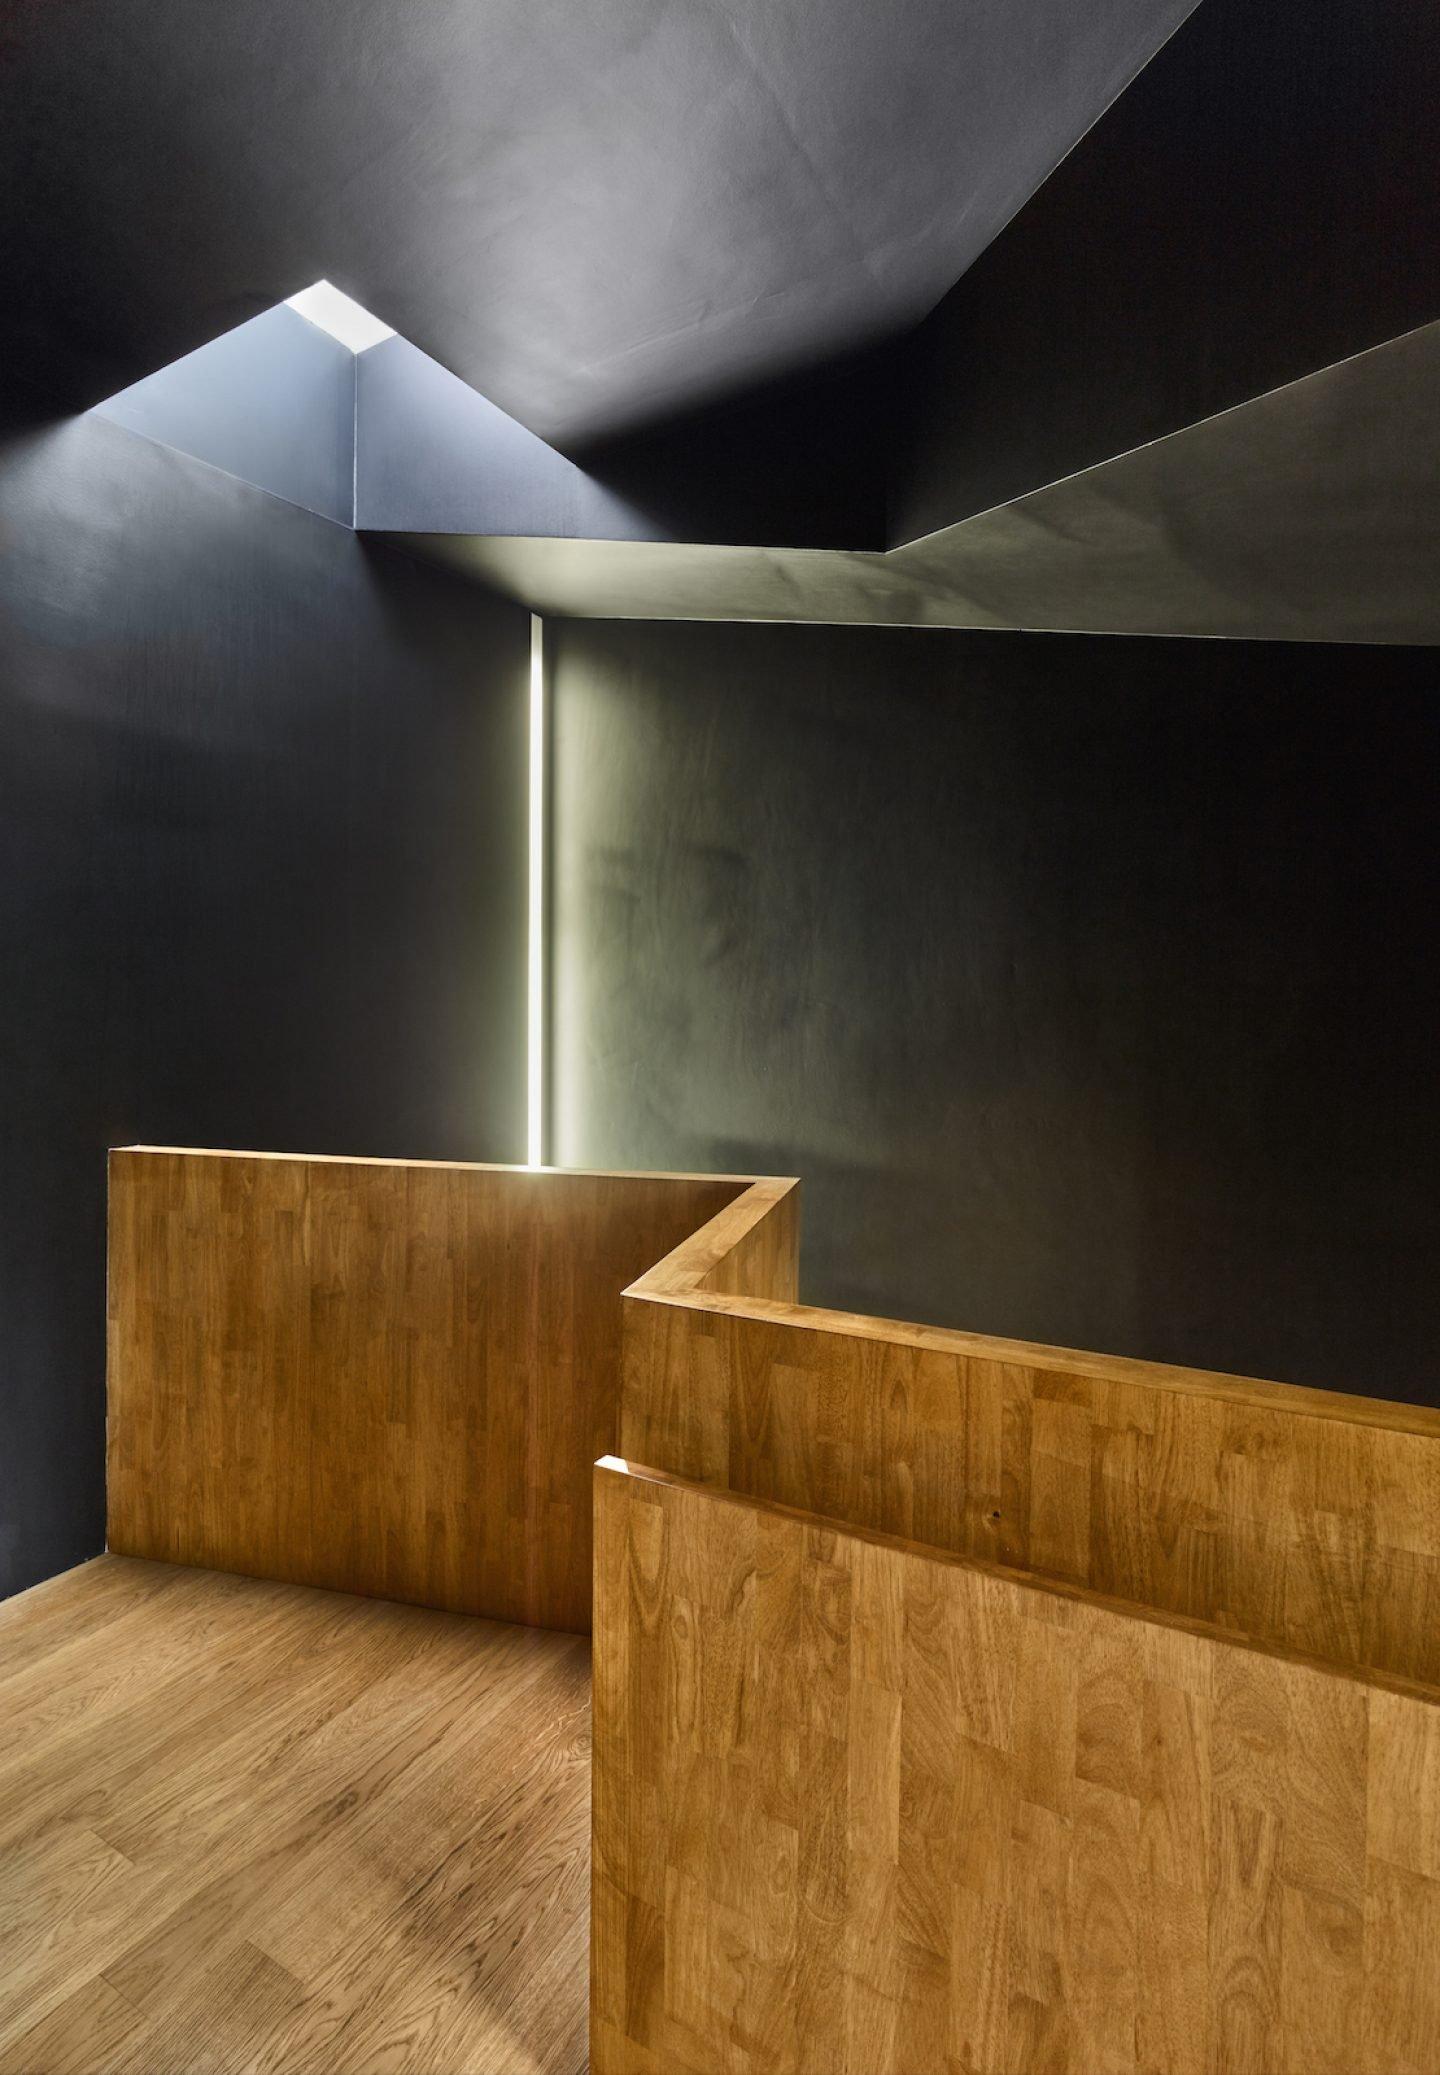 architecture_orbec_dominiquecoulon_associesarchitectes_01